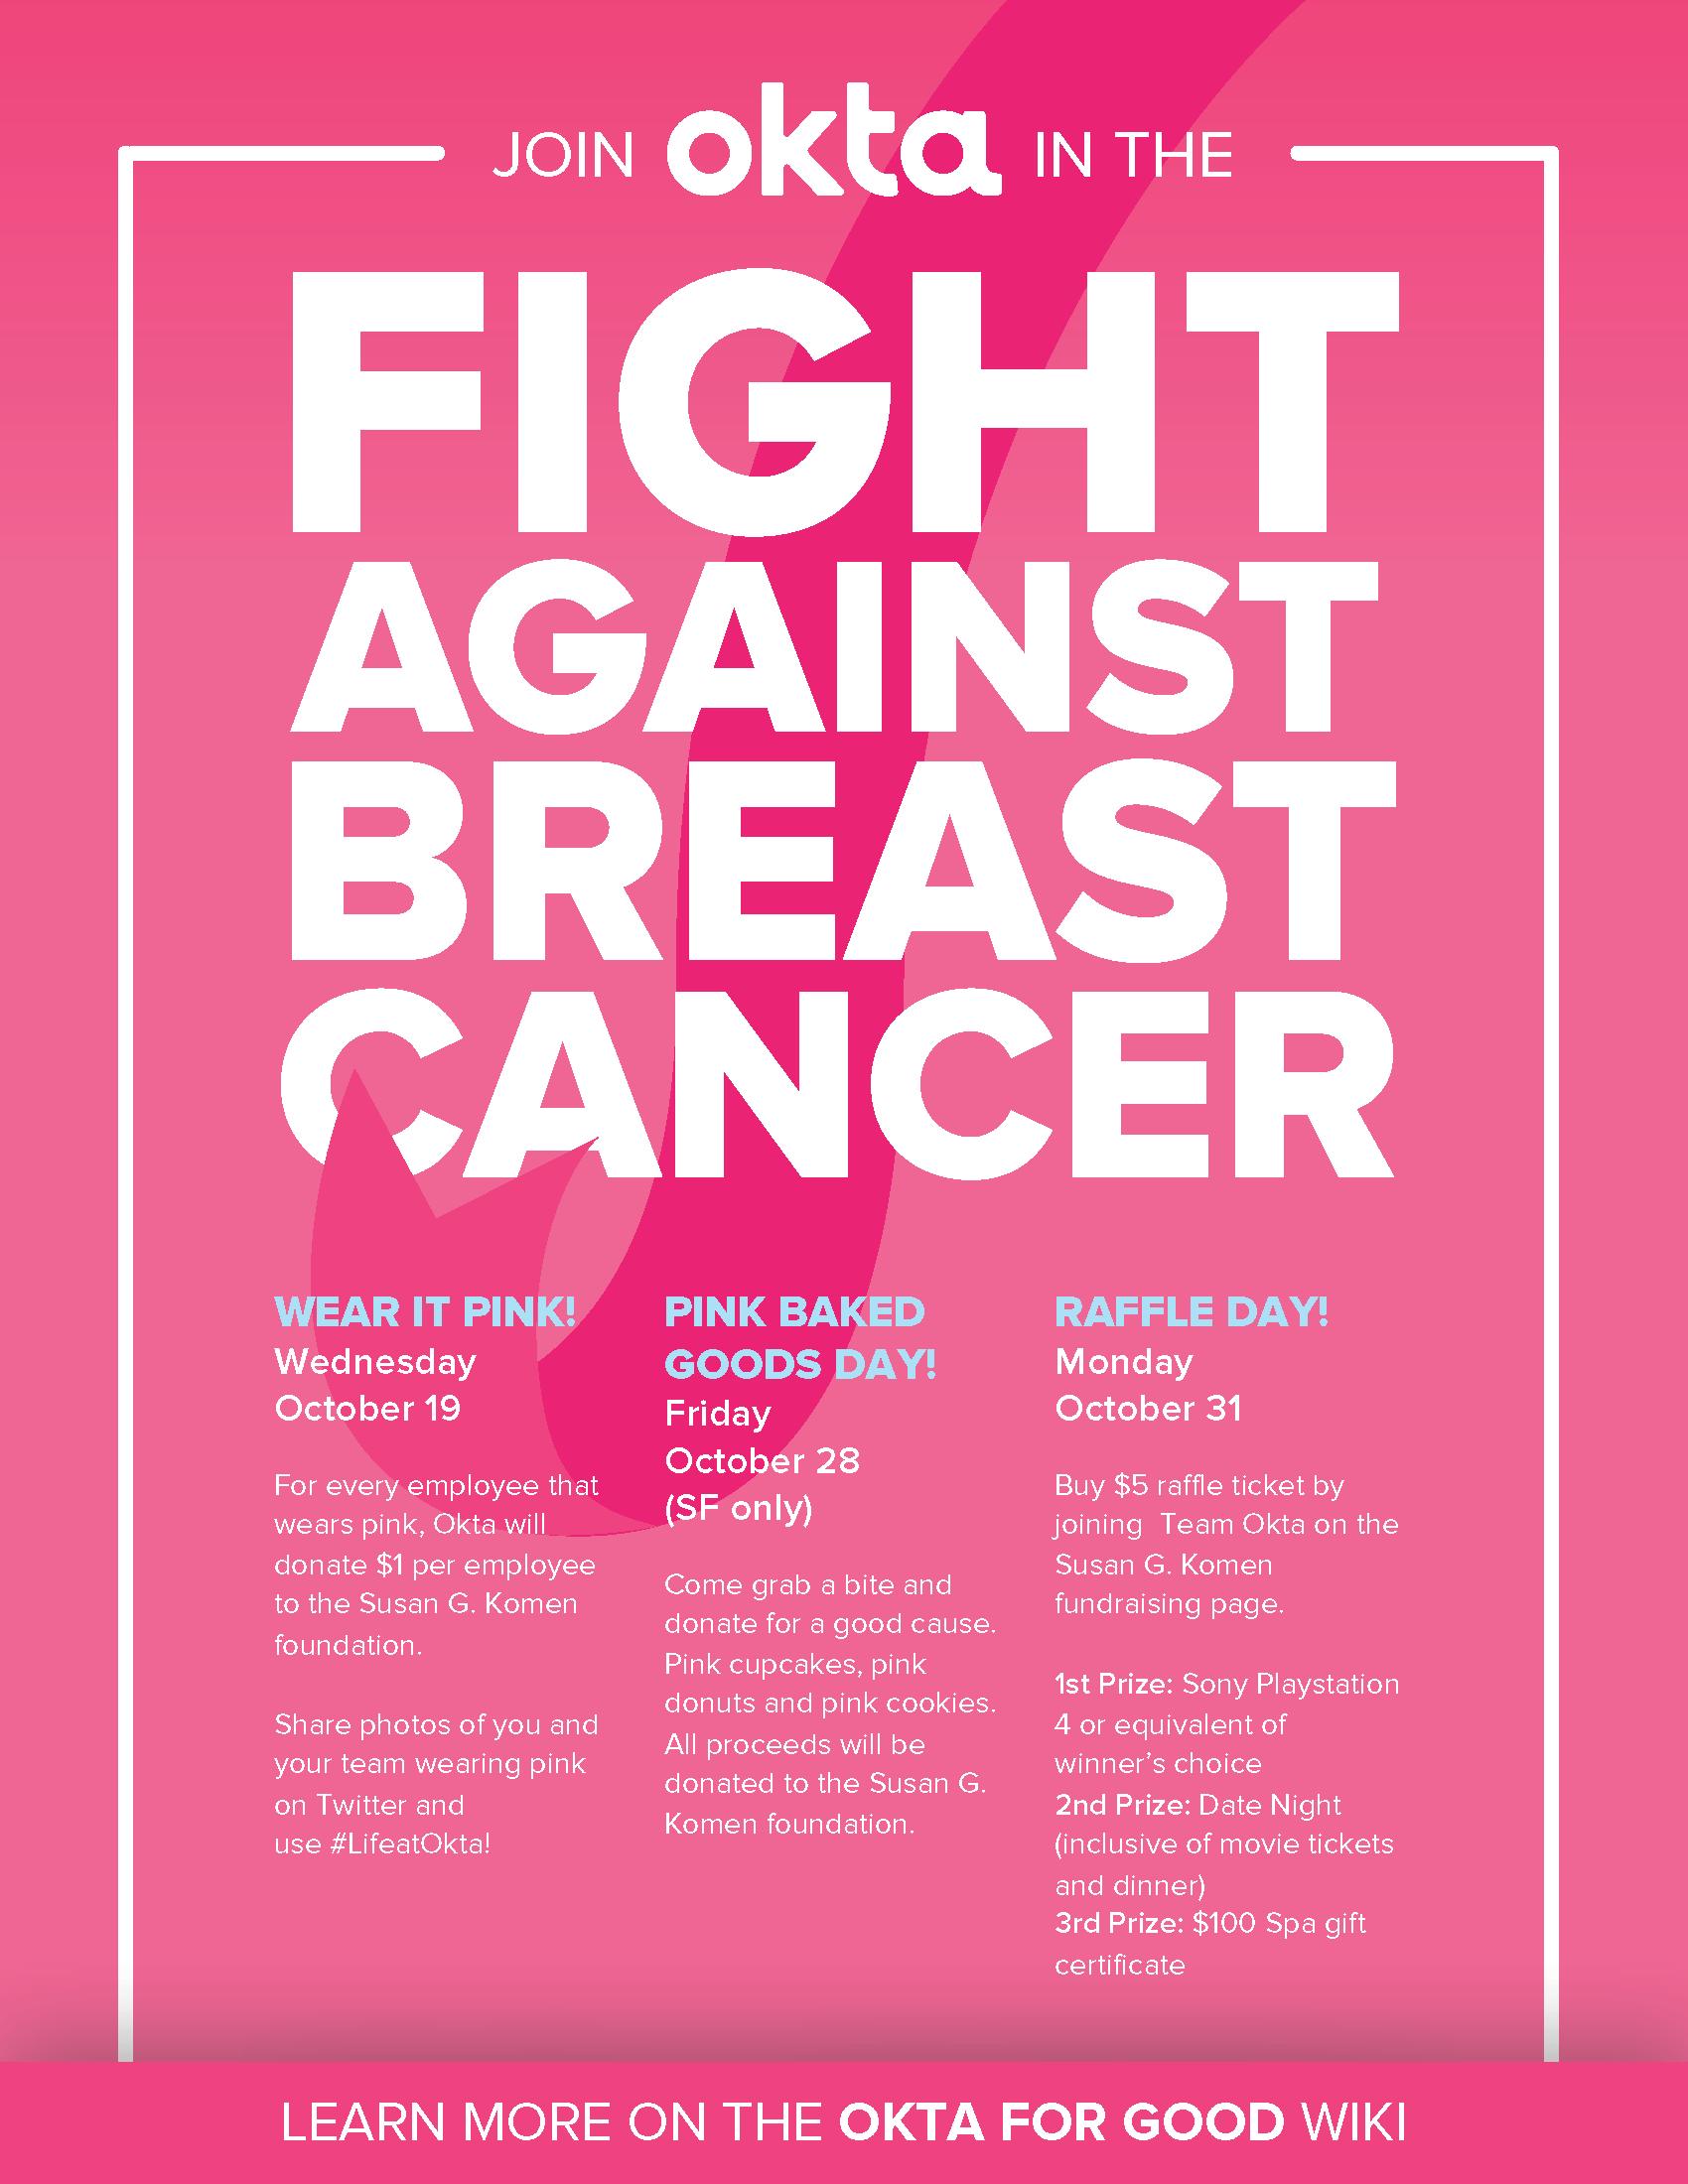 Okta_BreastCancerAwareness 3.20.46 PM_Page_4.png